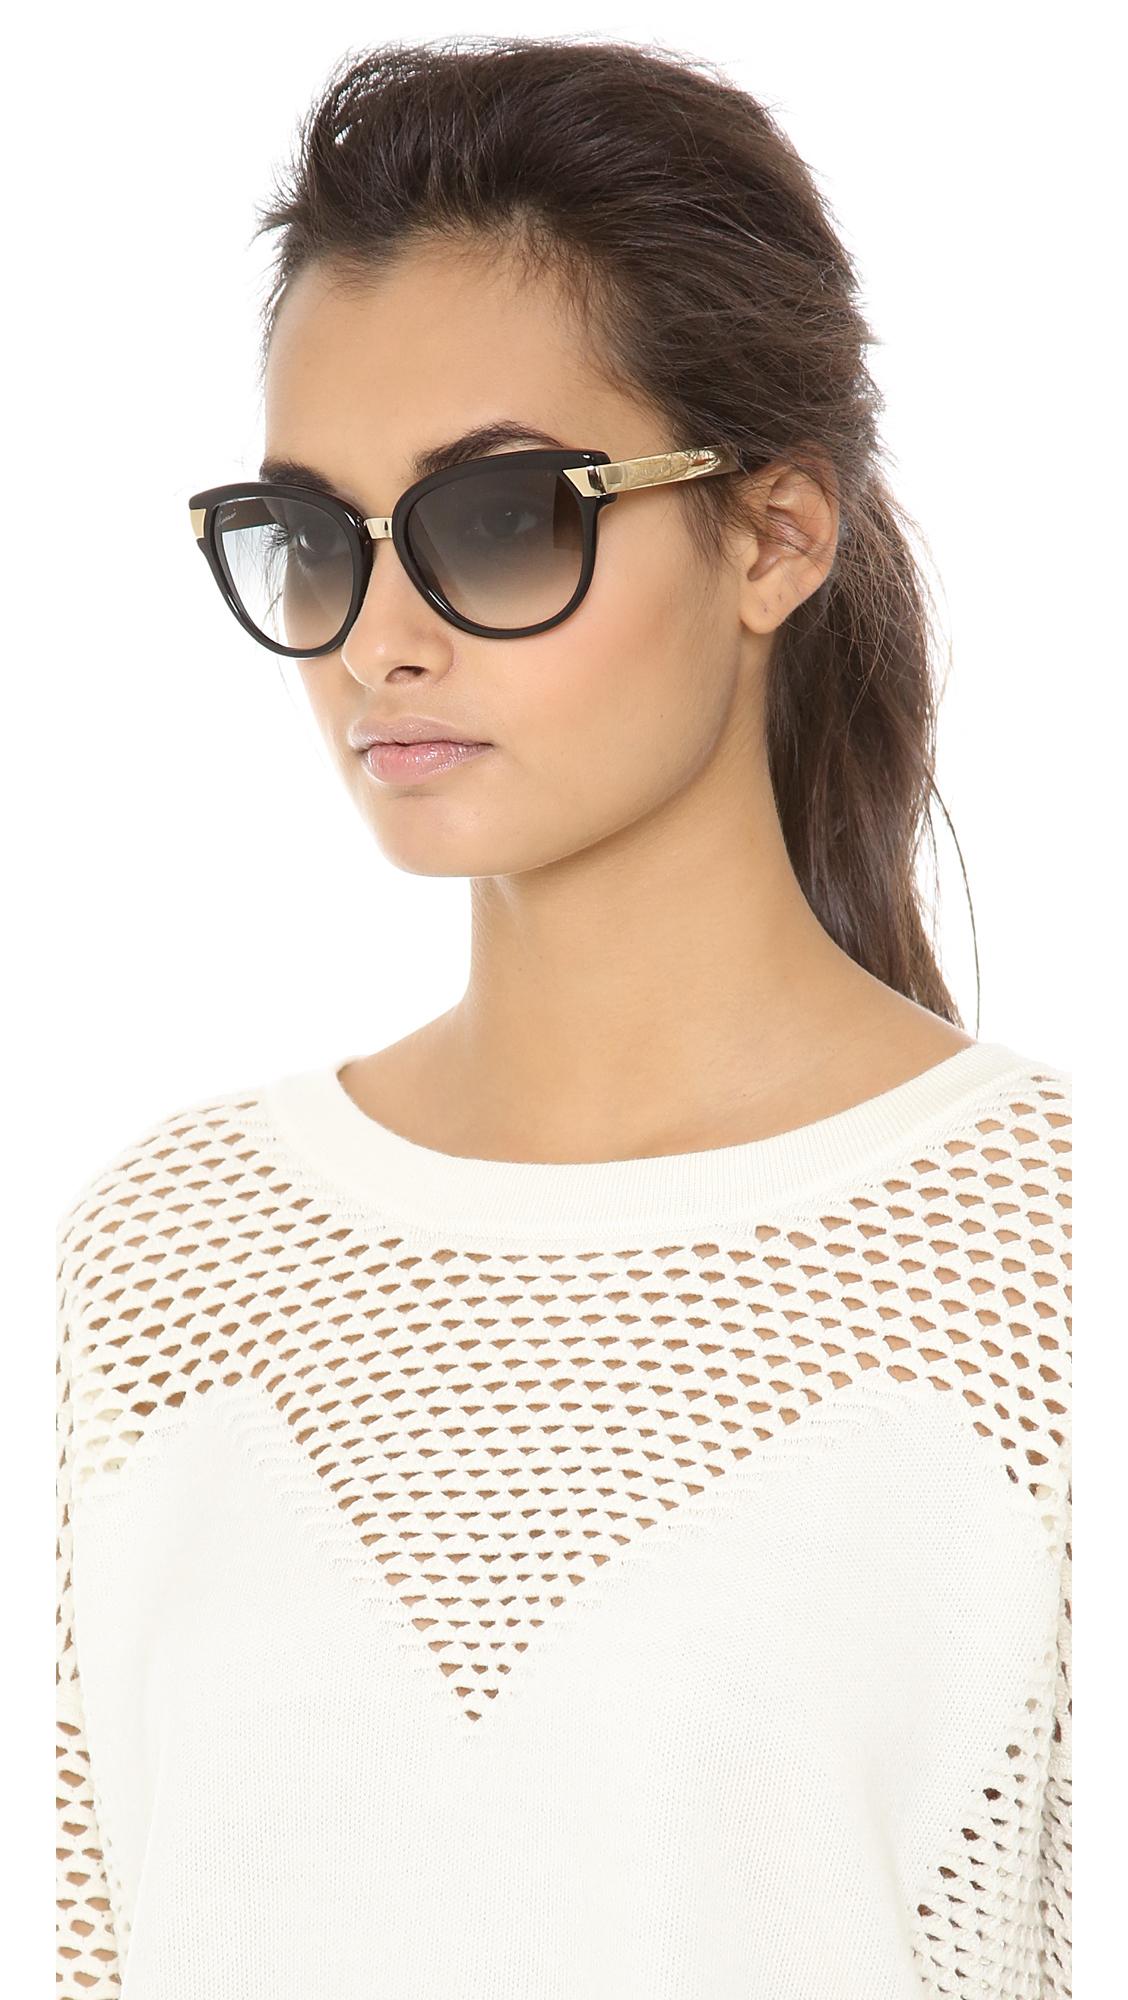 f59eed9e3d4 Lyst - Gucci Cat Eye Sunglasses Blackgreen Gradient in Black